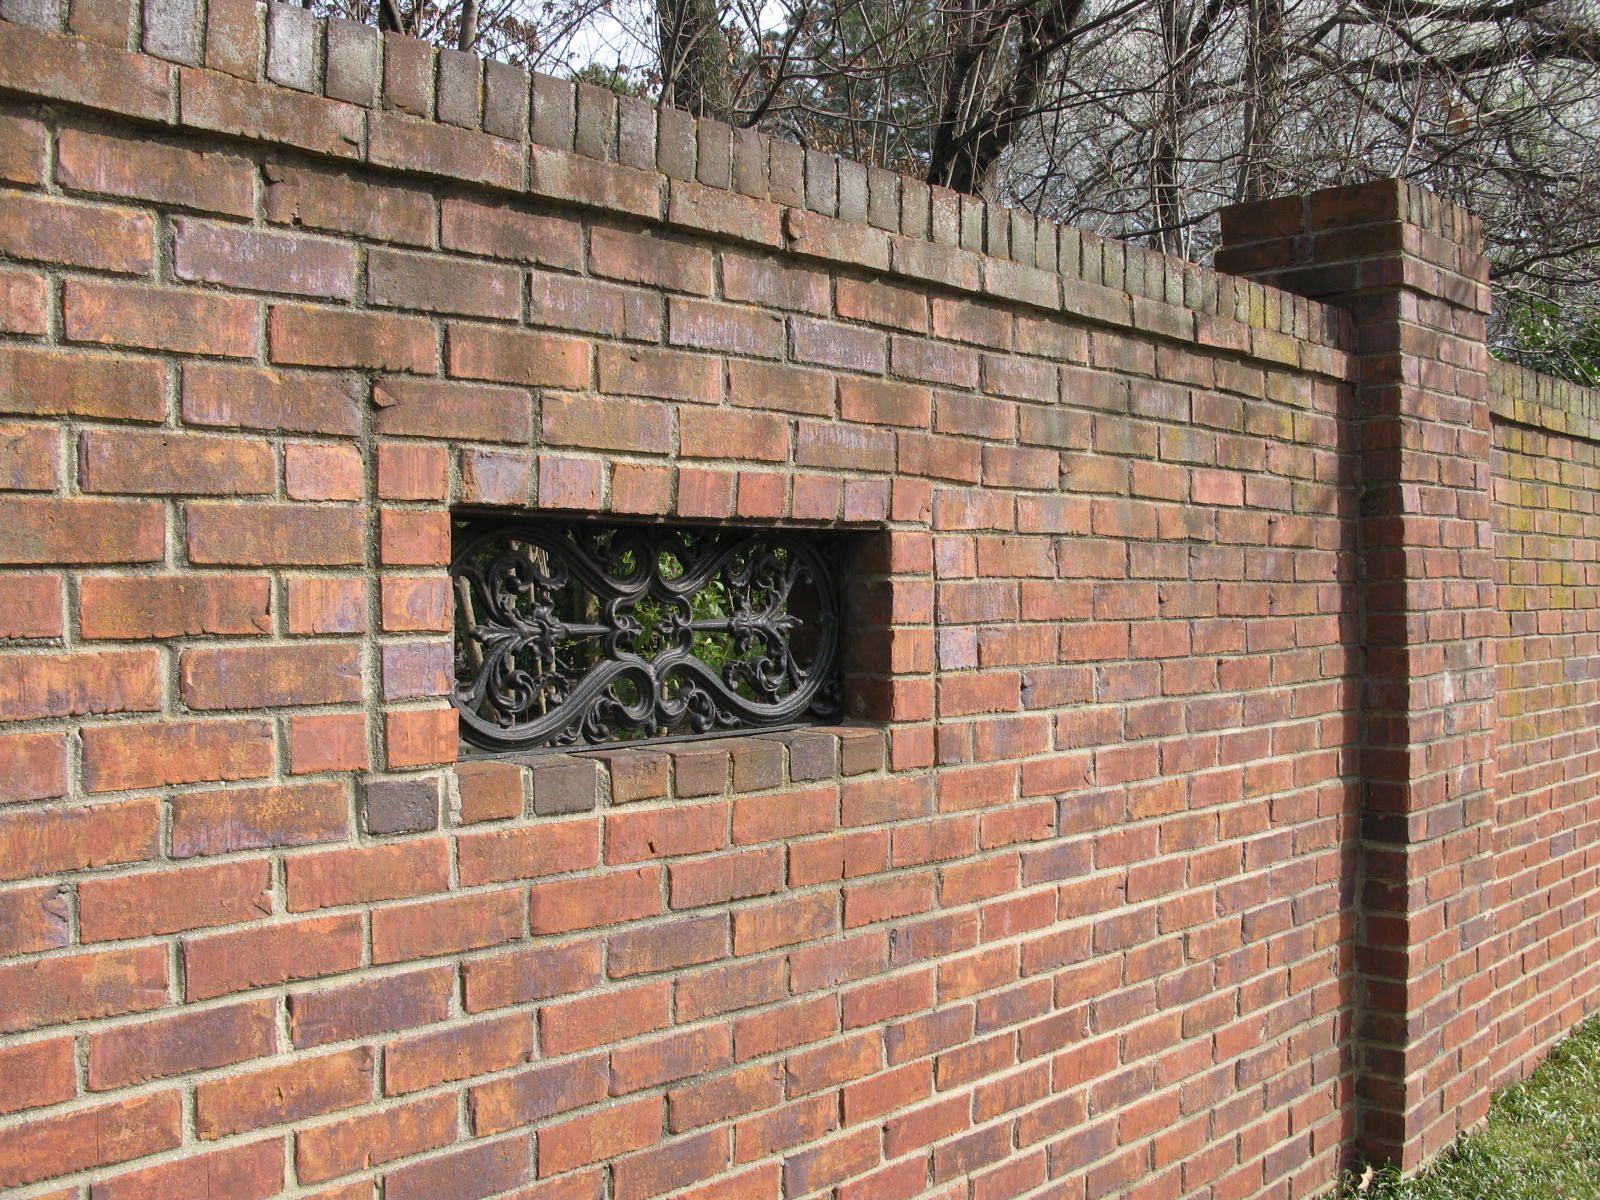 Walls and fences as a design element fences design for Brick fence designs plans